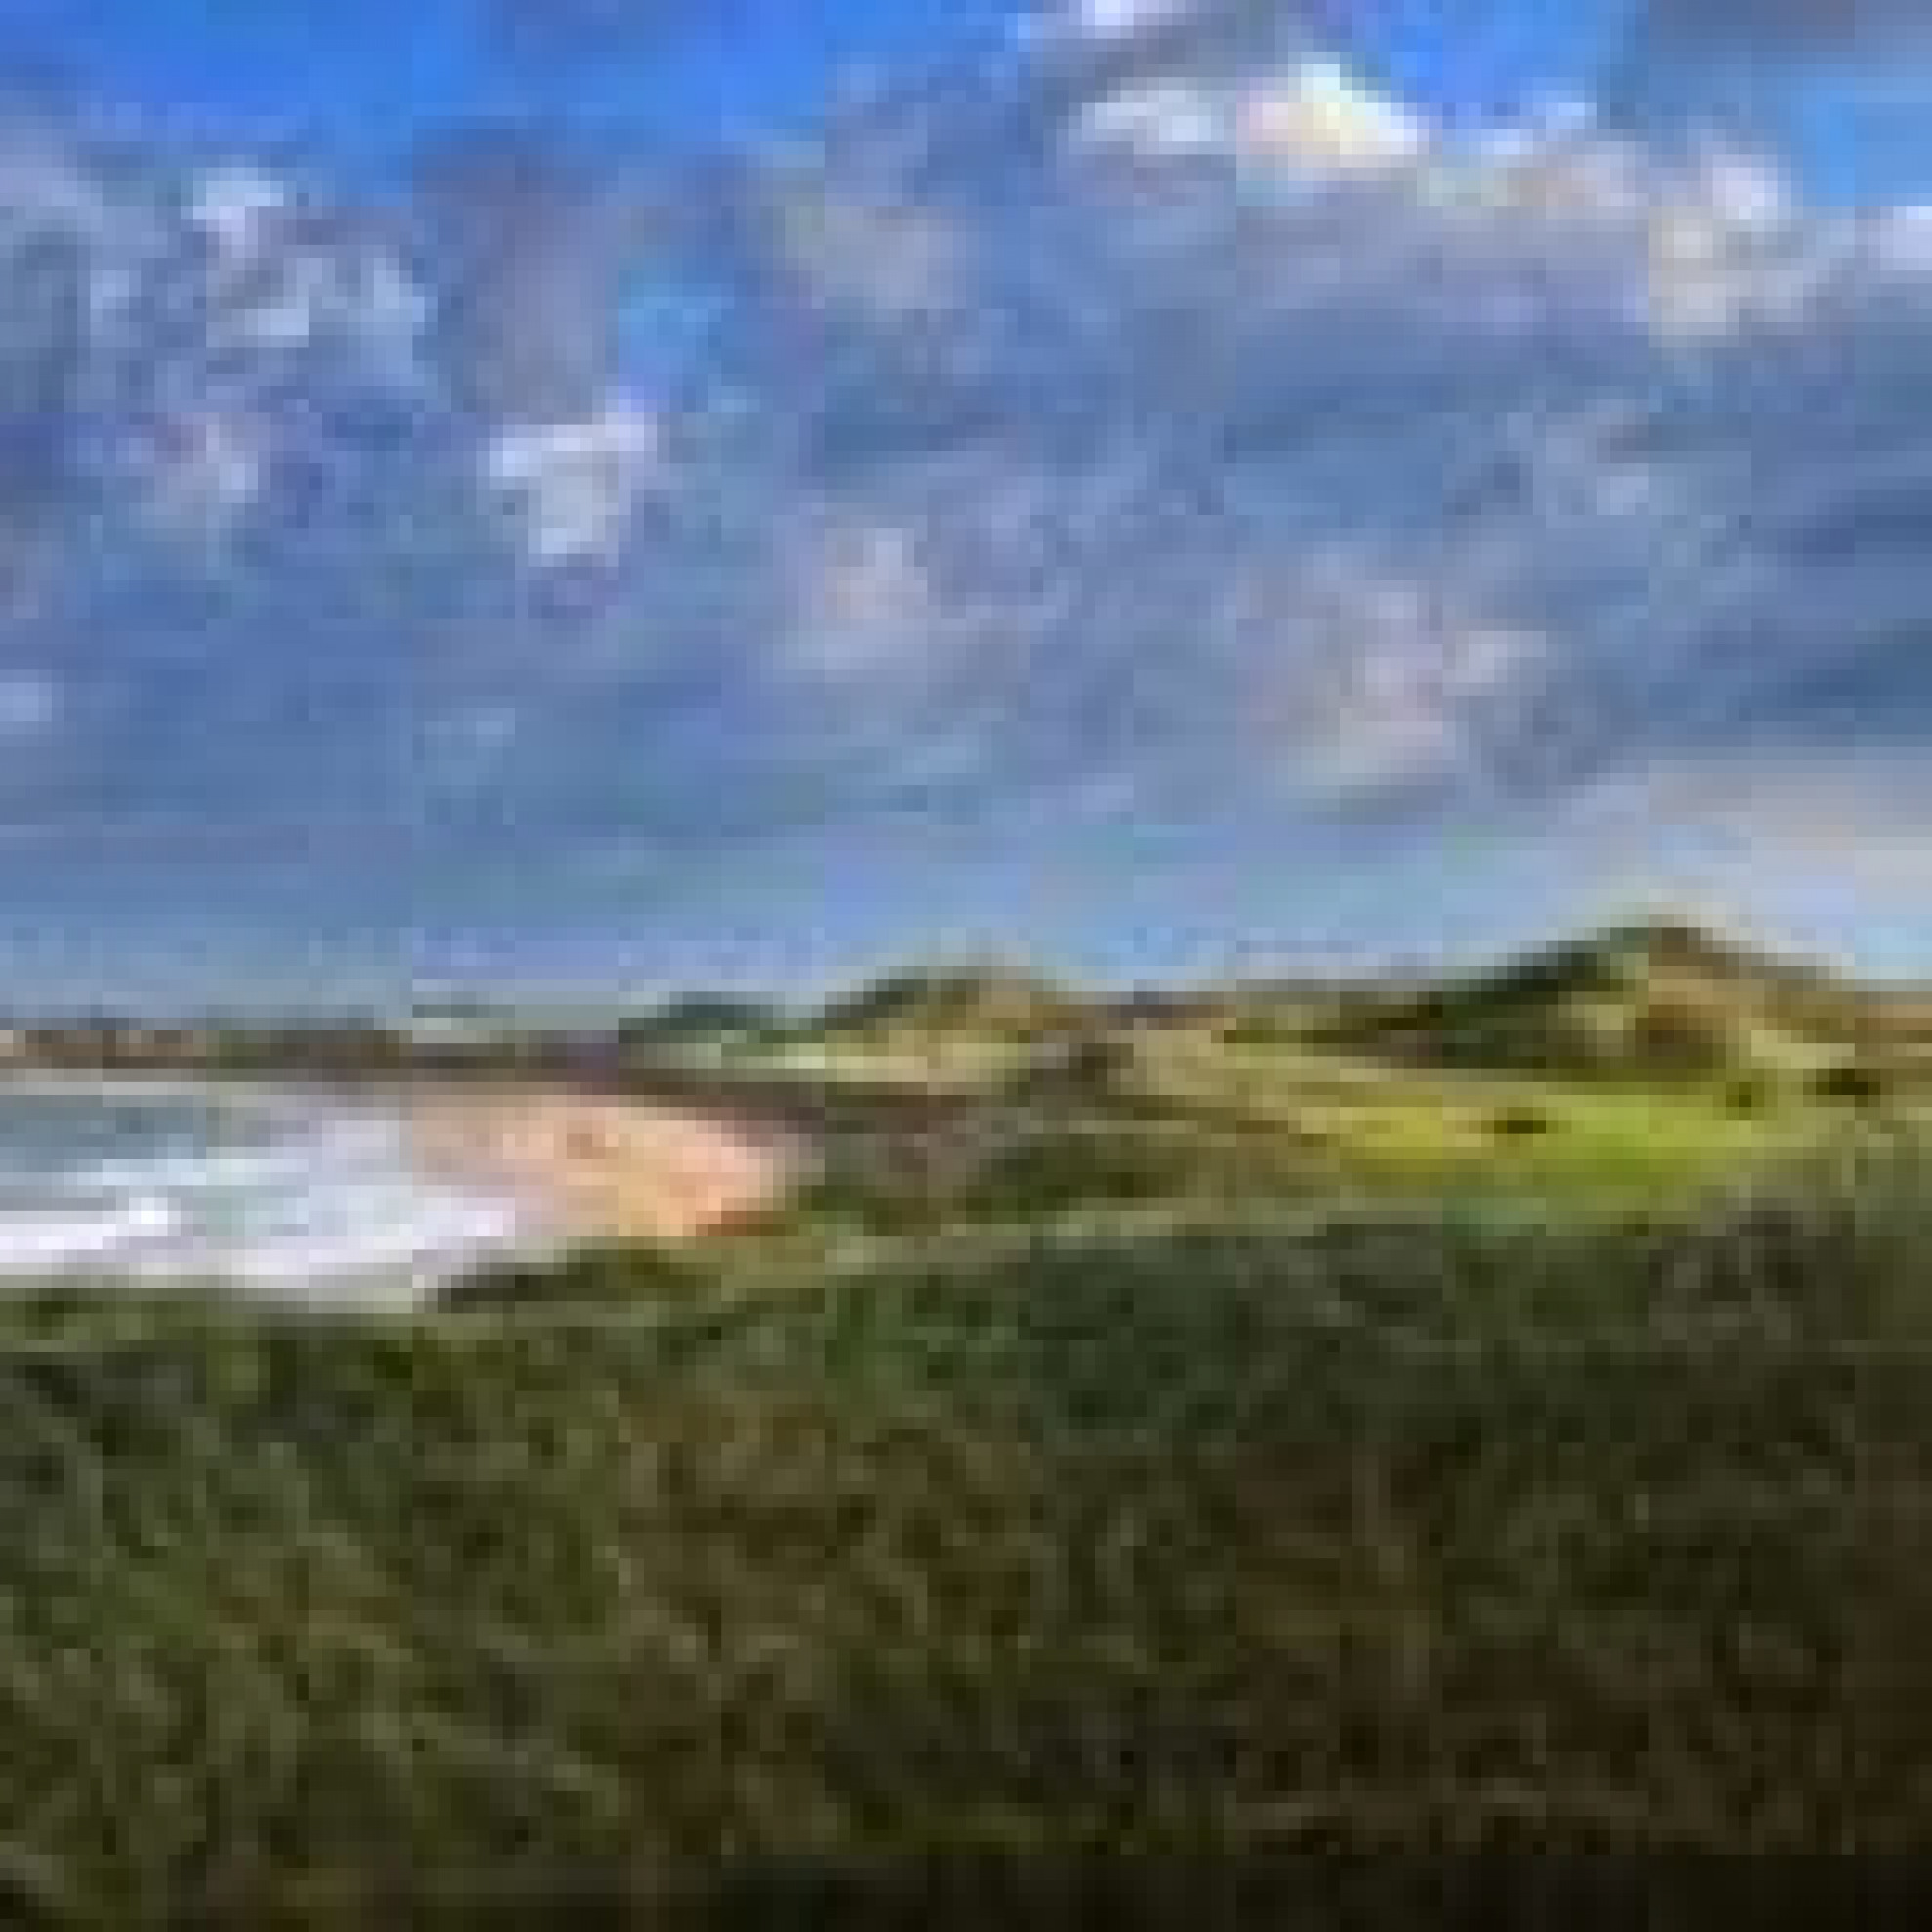 Trump International Golf Links & Hotel Doonbeg Ireland - Green Golf